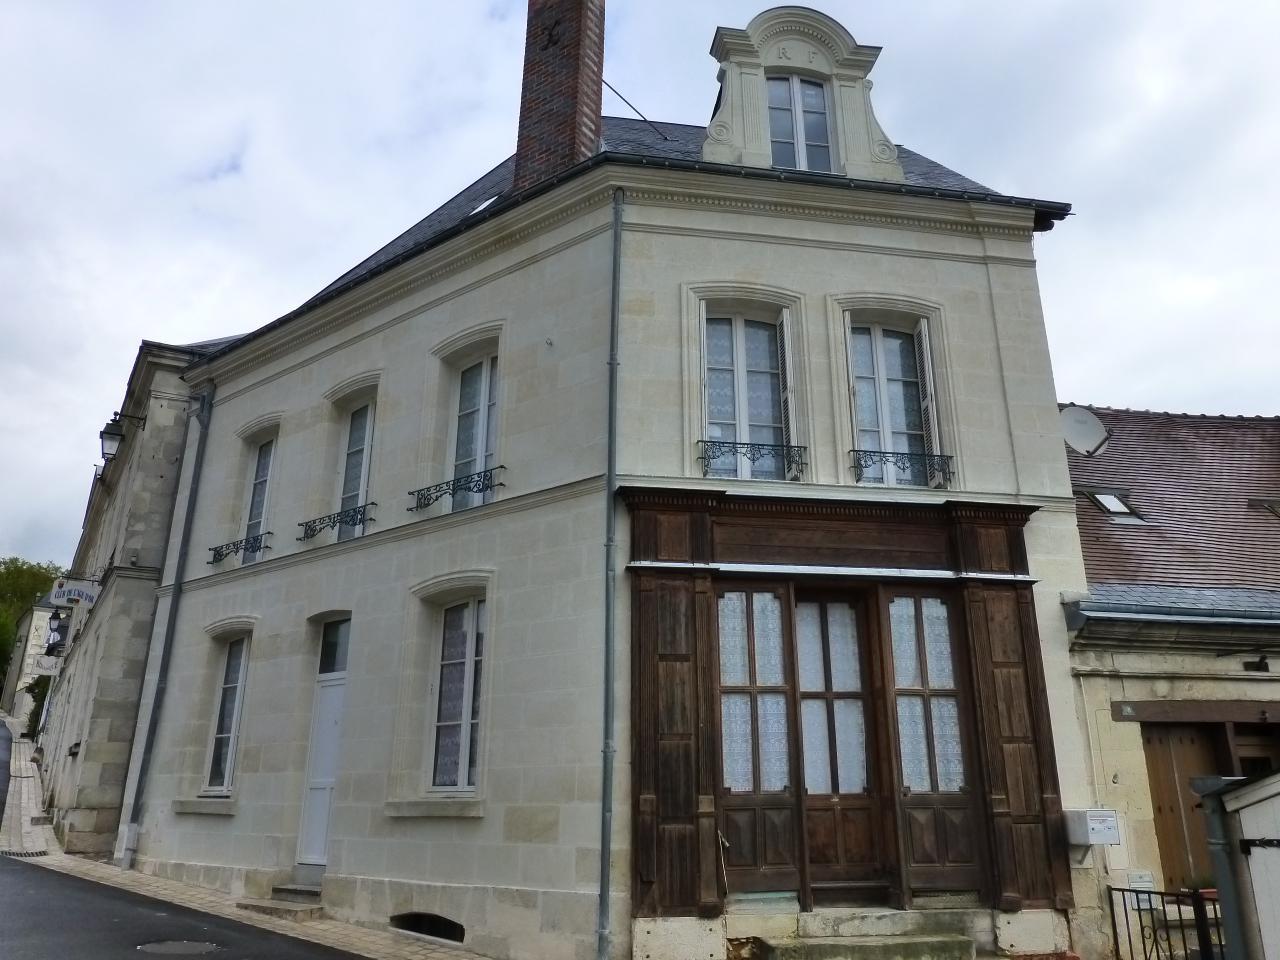 Rénovation pierre Reugny, Loire rénovation